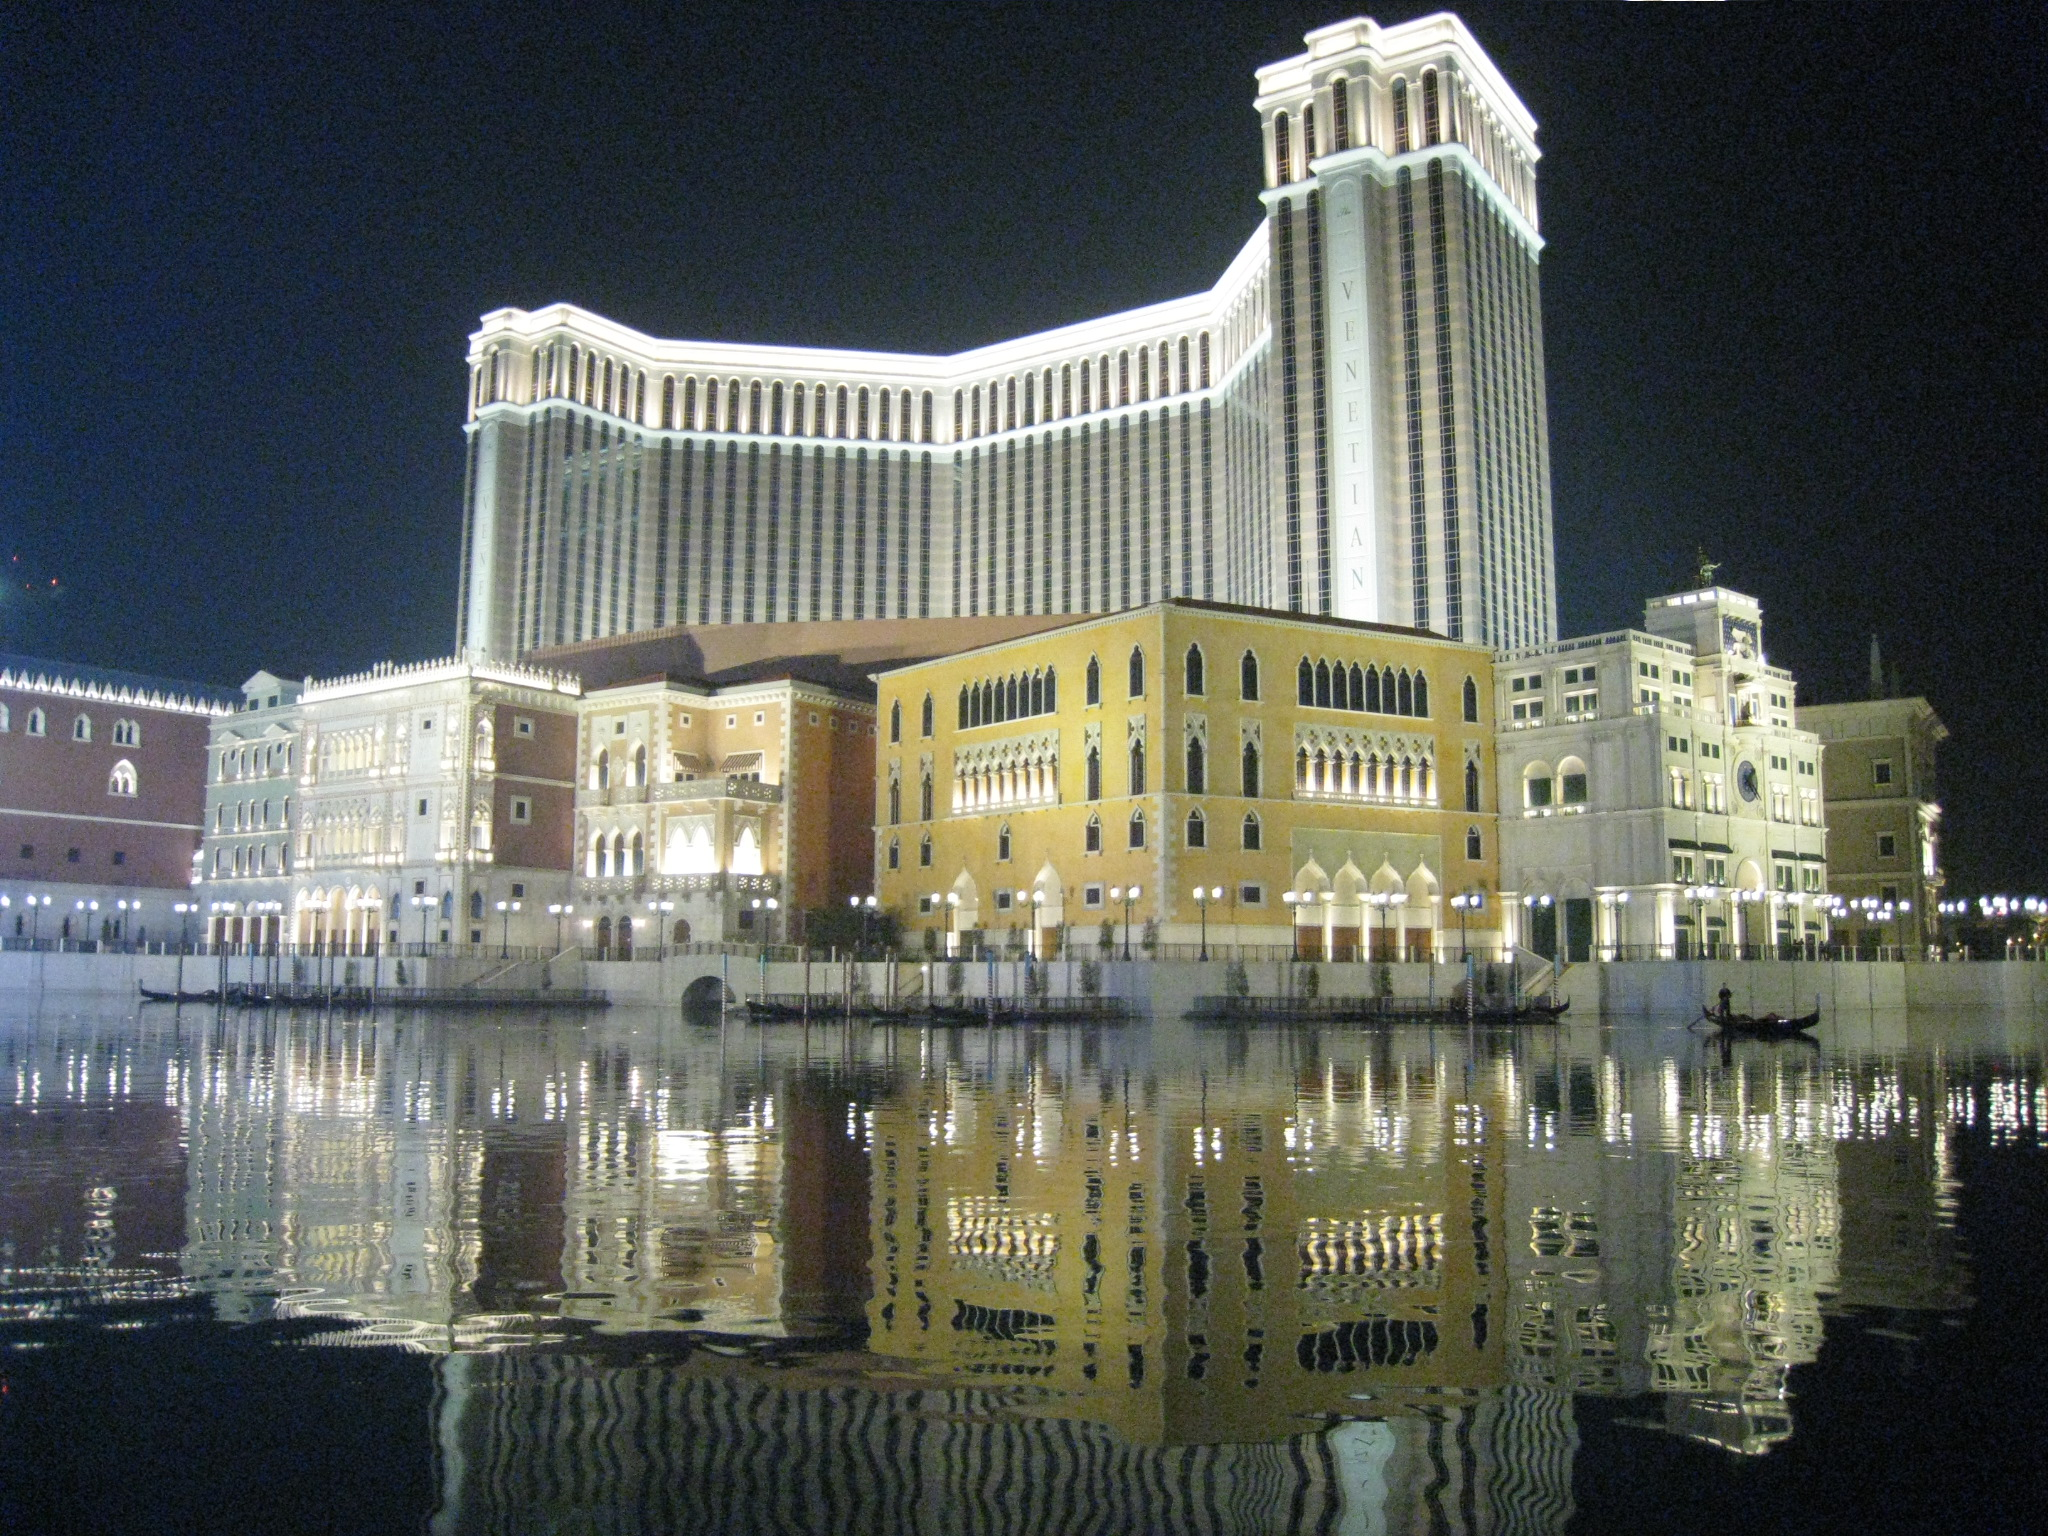 Montecarlo casino 11